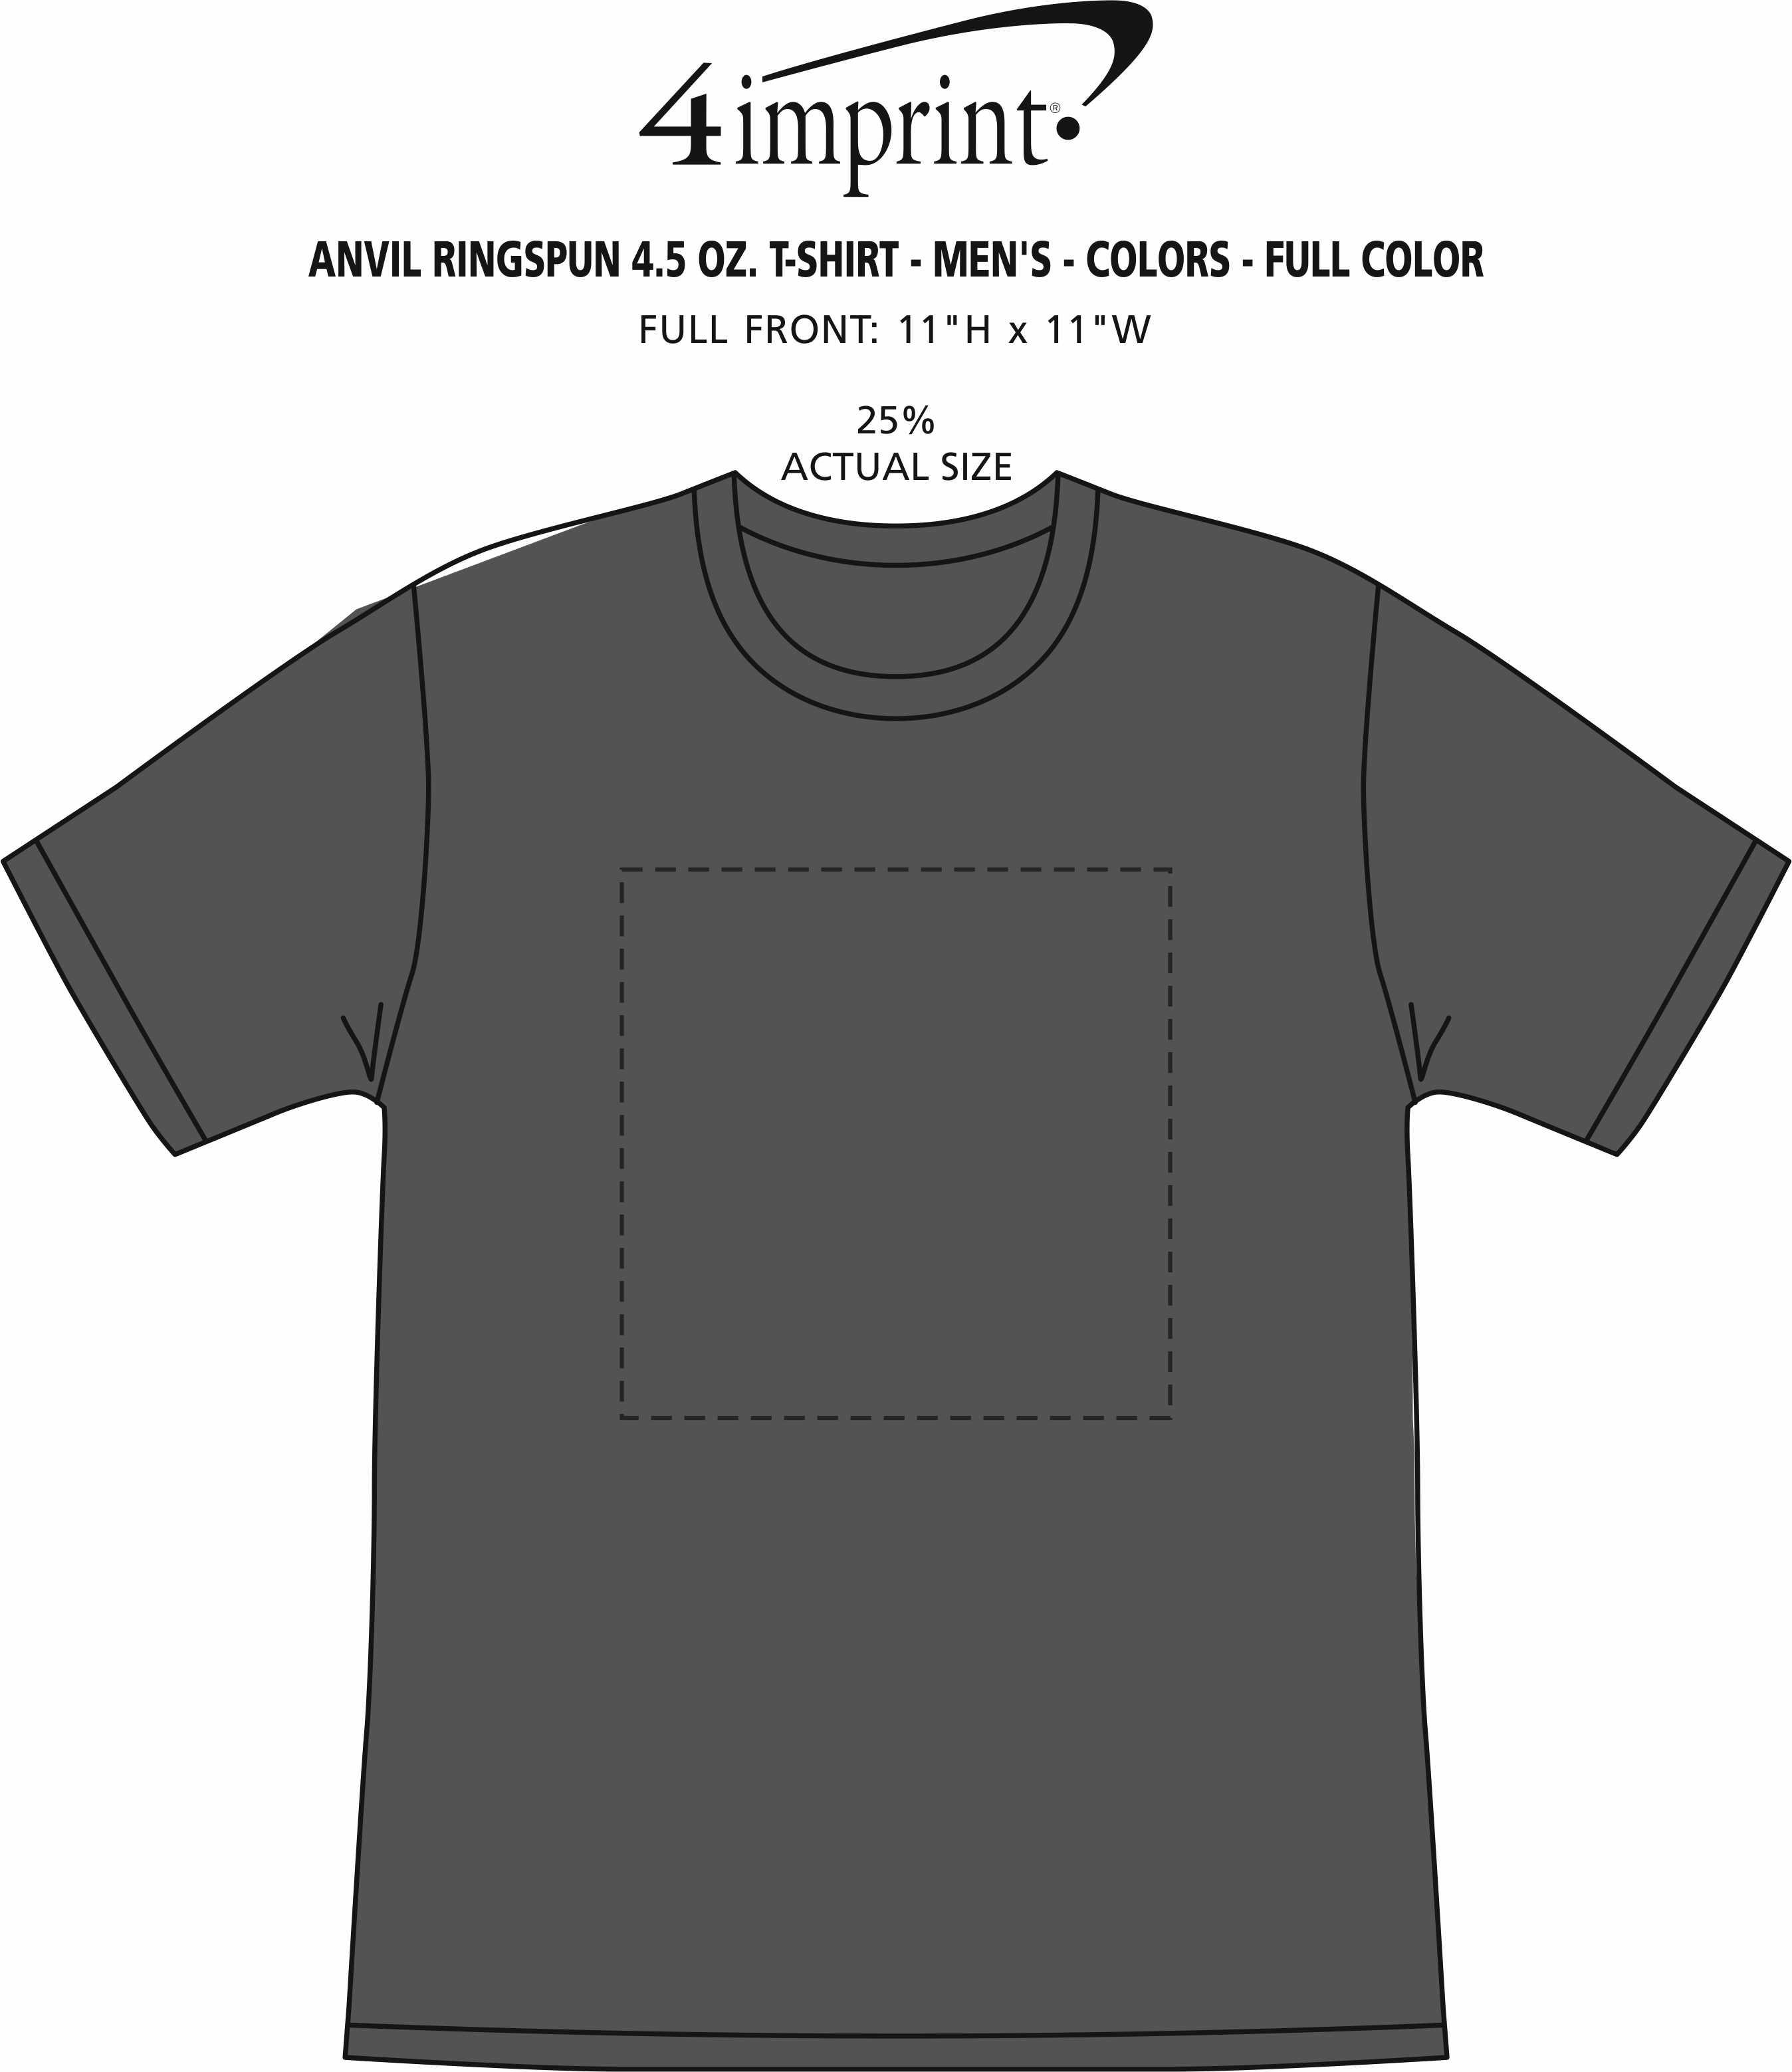 Imprint Area of Anvil Ringspun 4.5 oz. T-Shirt - Men's - Colors - Full Color